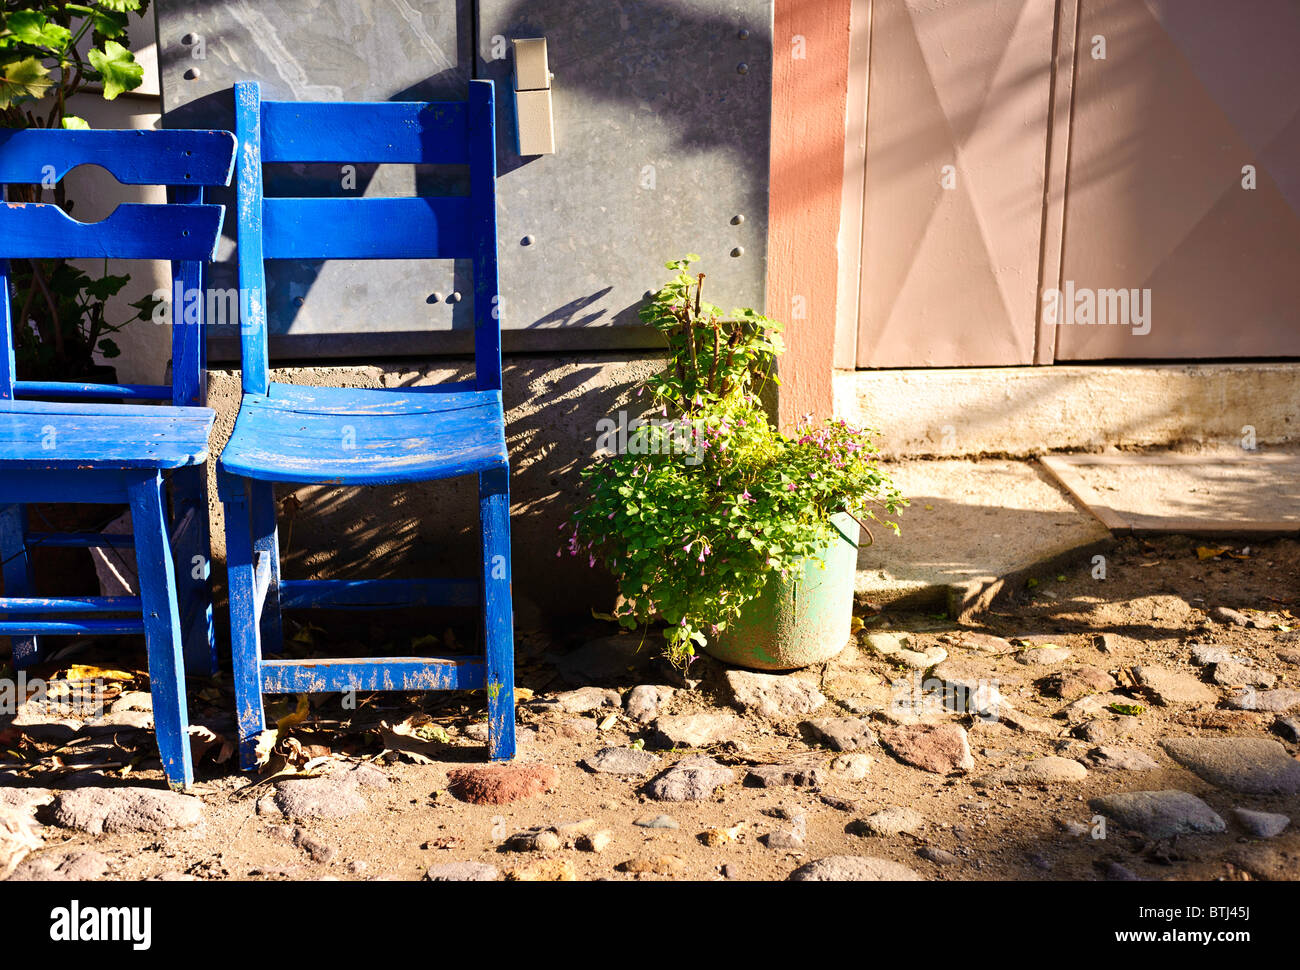 A street scene as found in the main town of Cunda Island, near Ayvalik, Turkey. - Stock Image